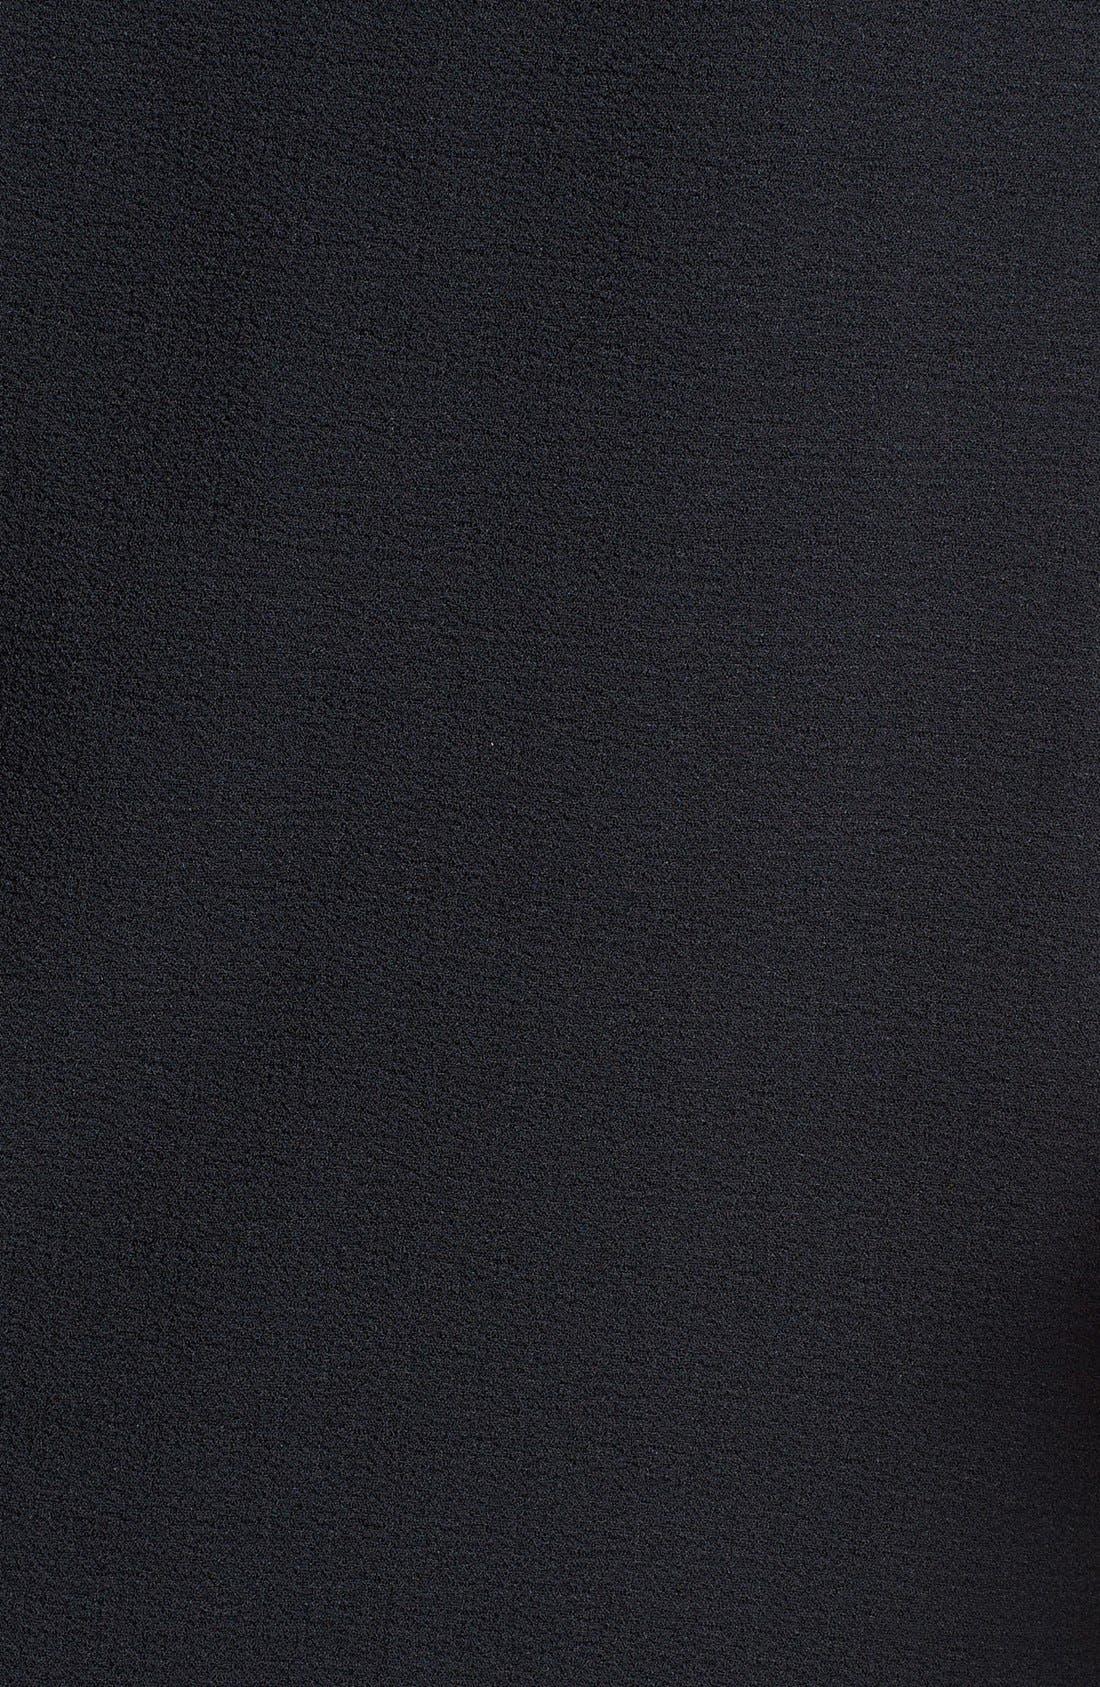 Alternate Image 3  - BB Dakota 'Noland' Textured Crepe Dress